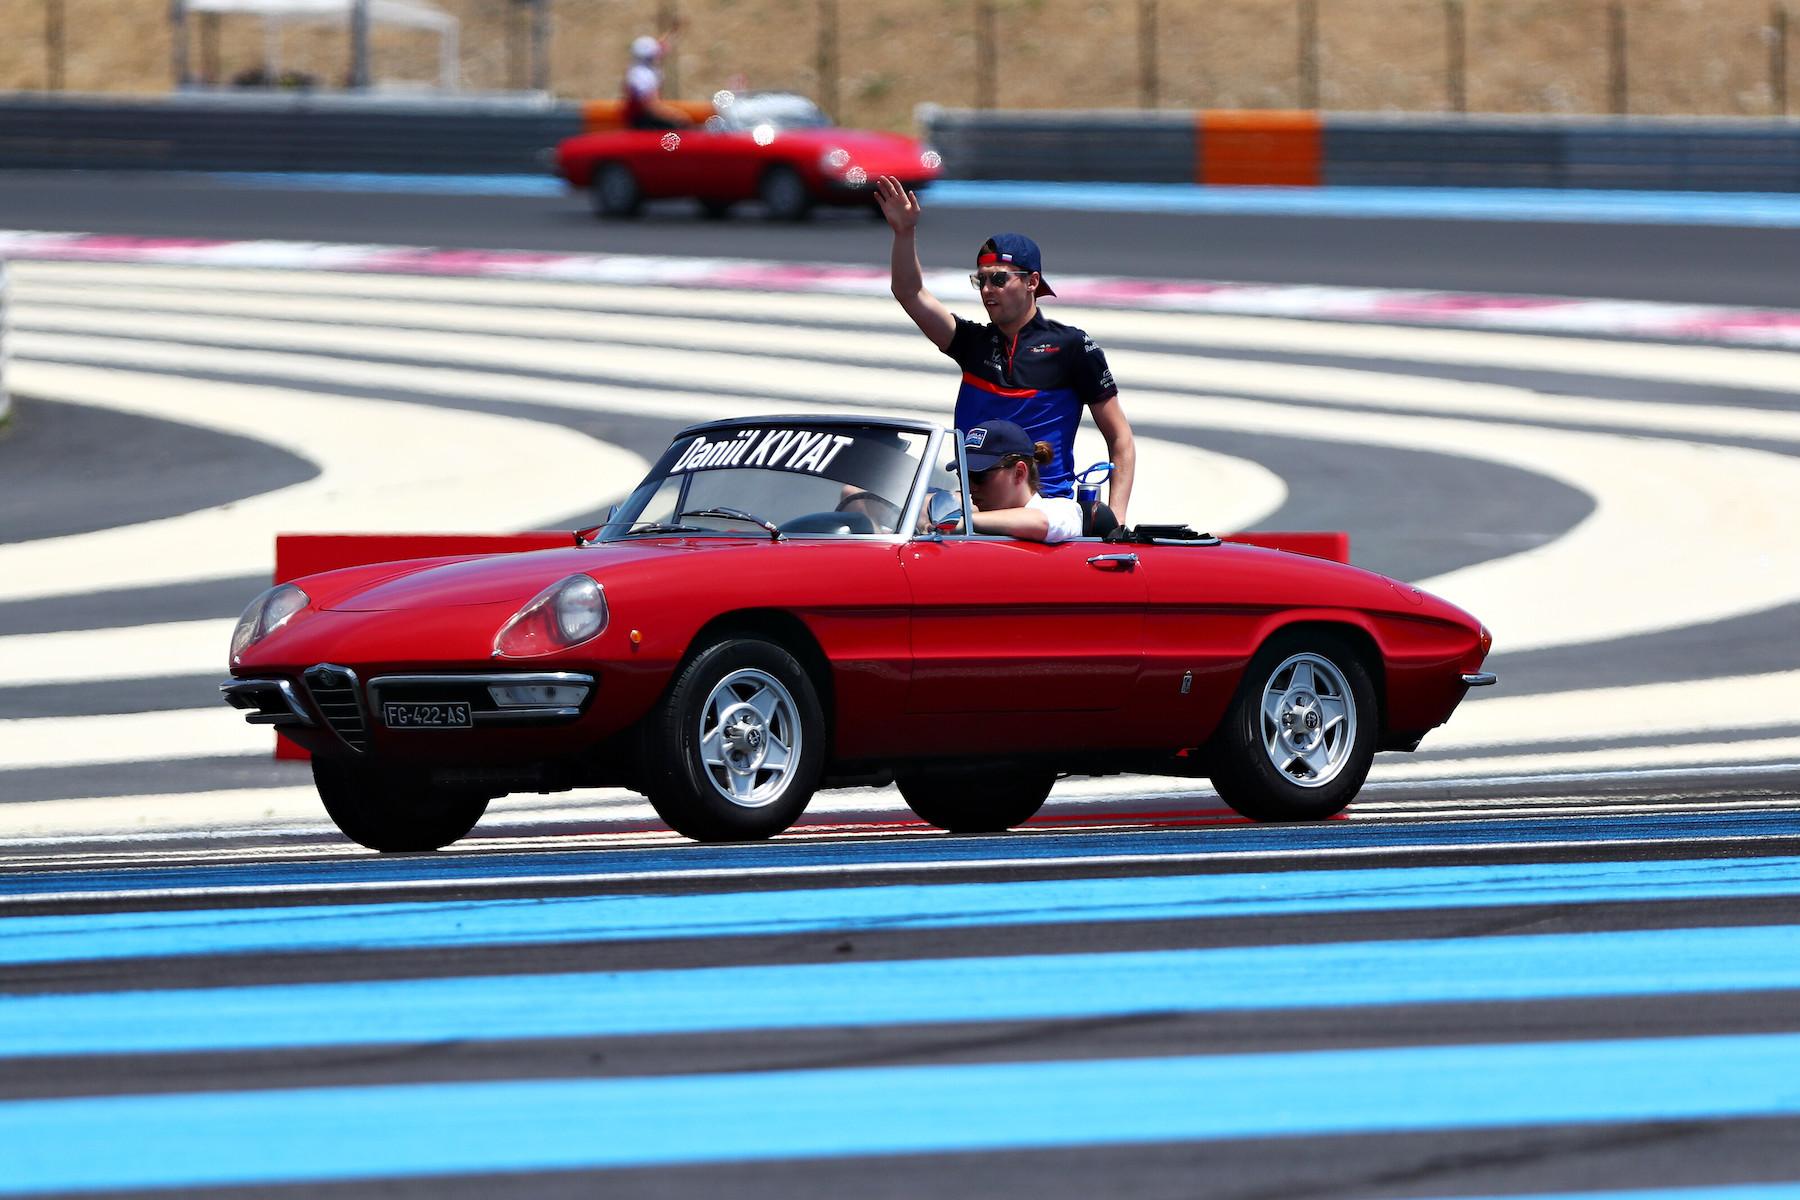 3 2019 French GP Sunday 31.jpg